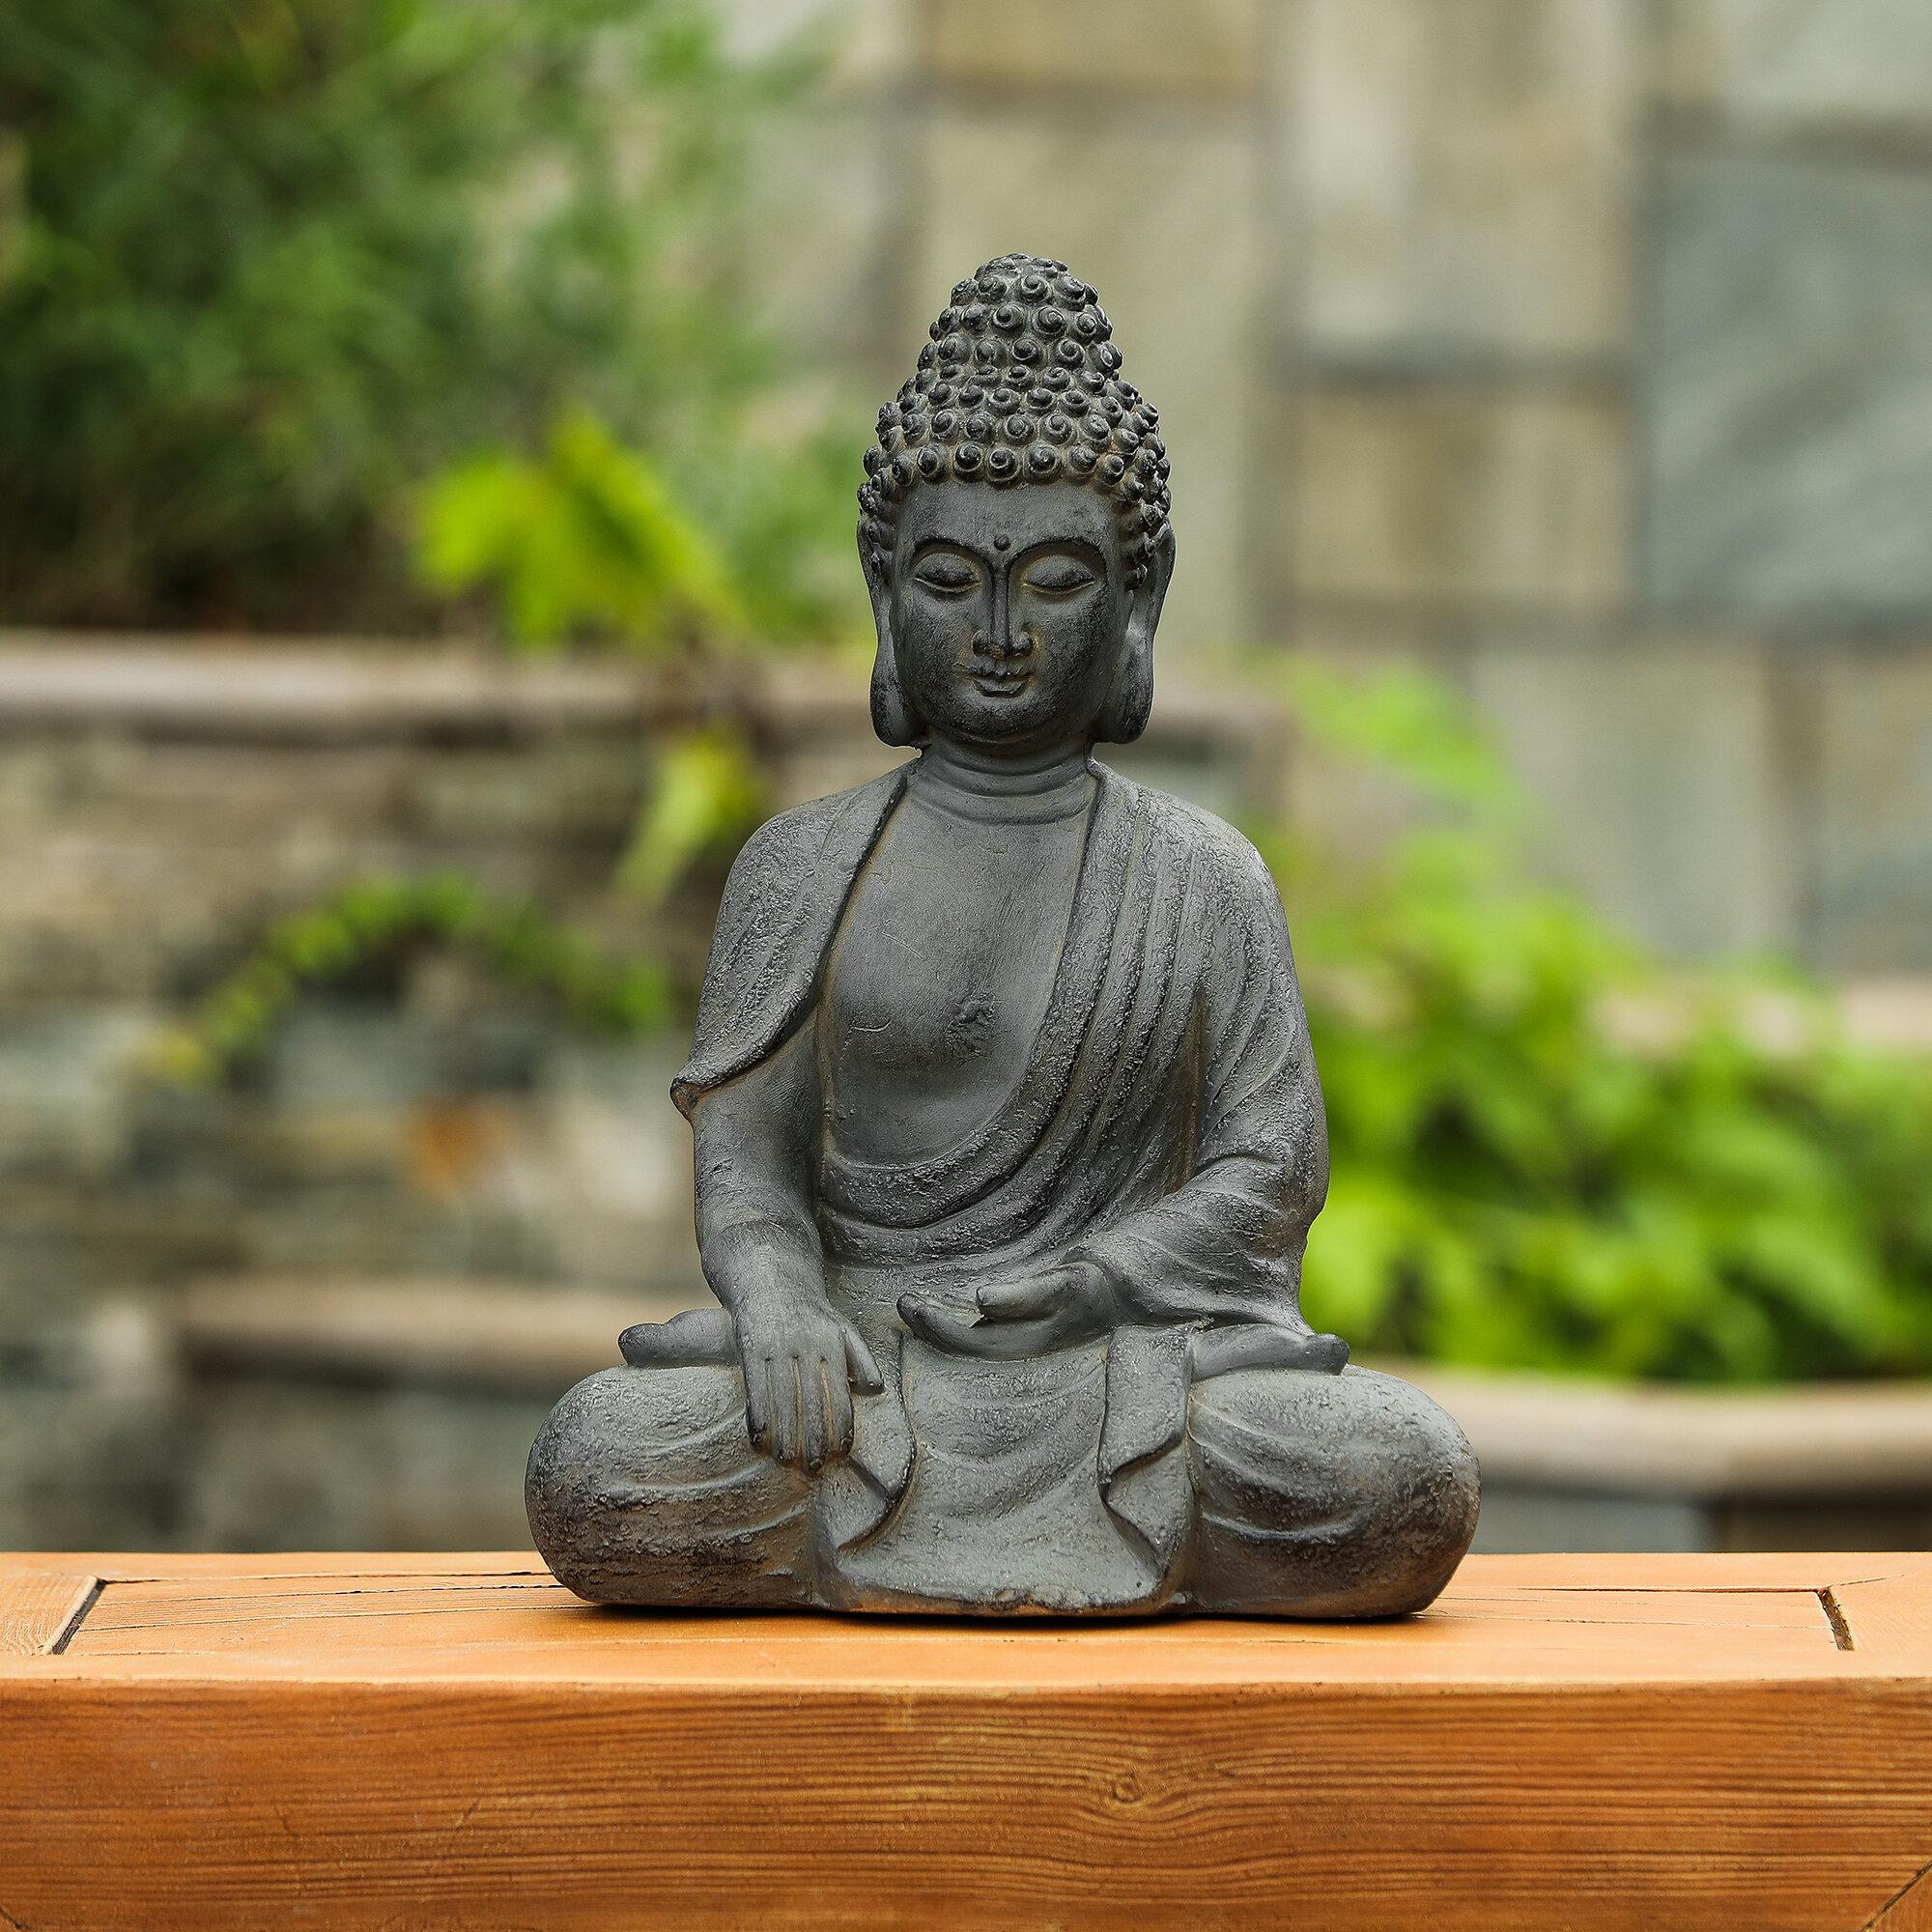 Freeport Park Kaya Enlightened Buddha Garden Statue Reviews Wayfair